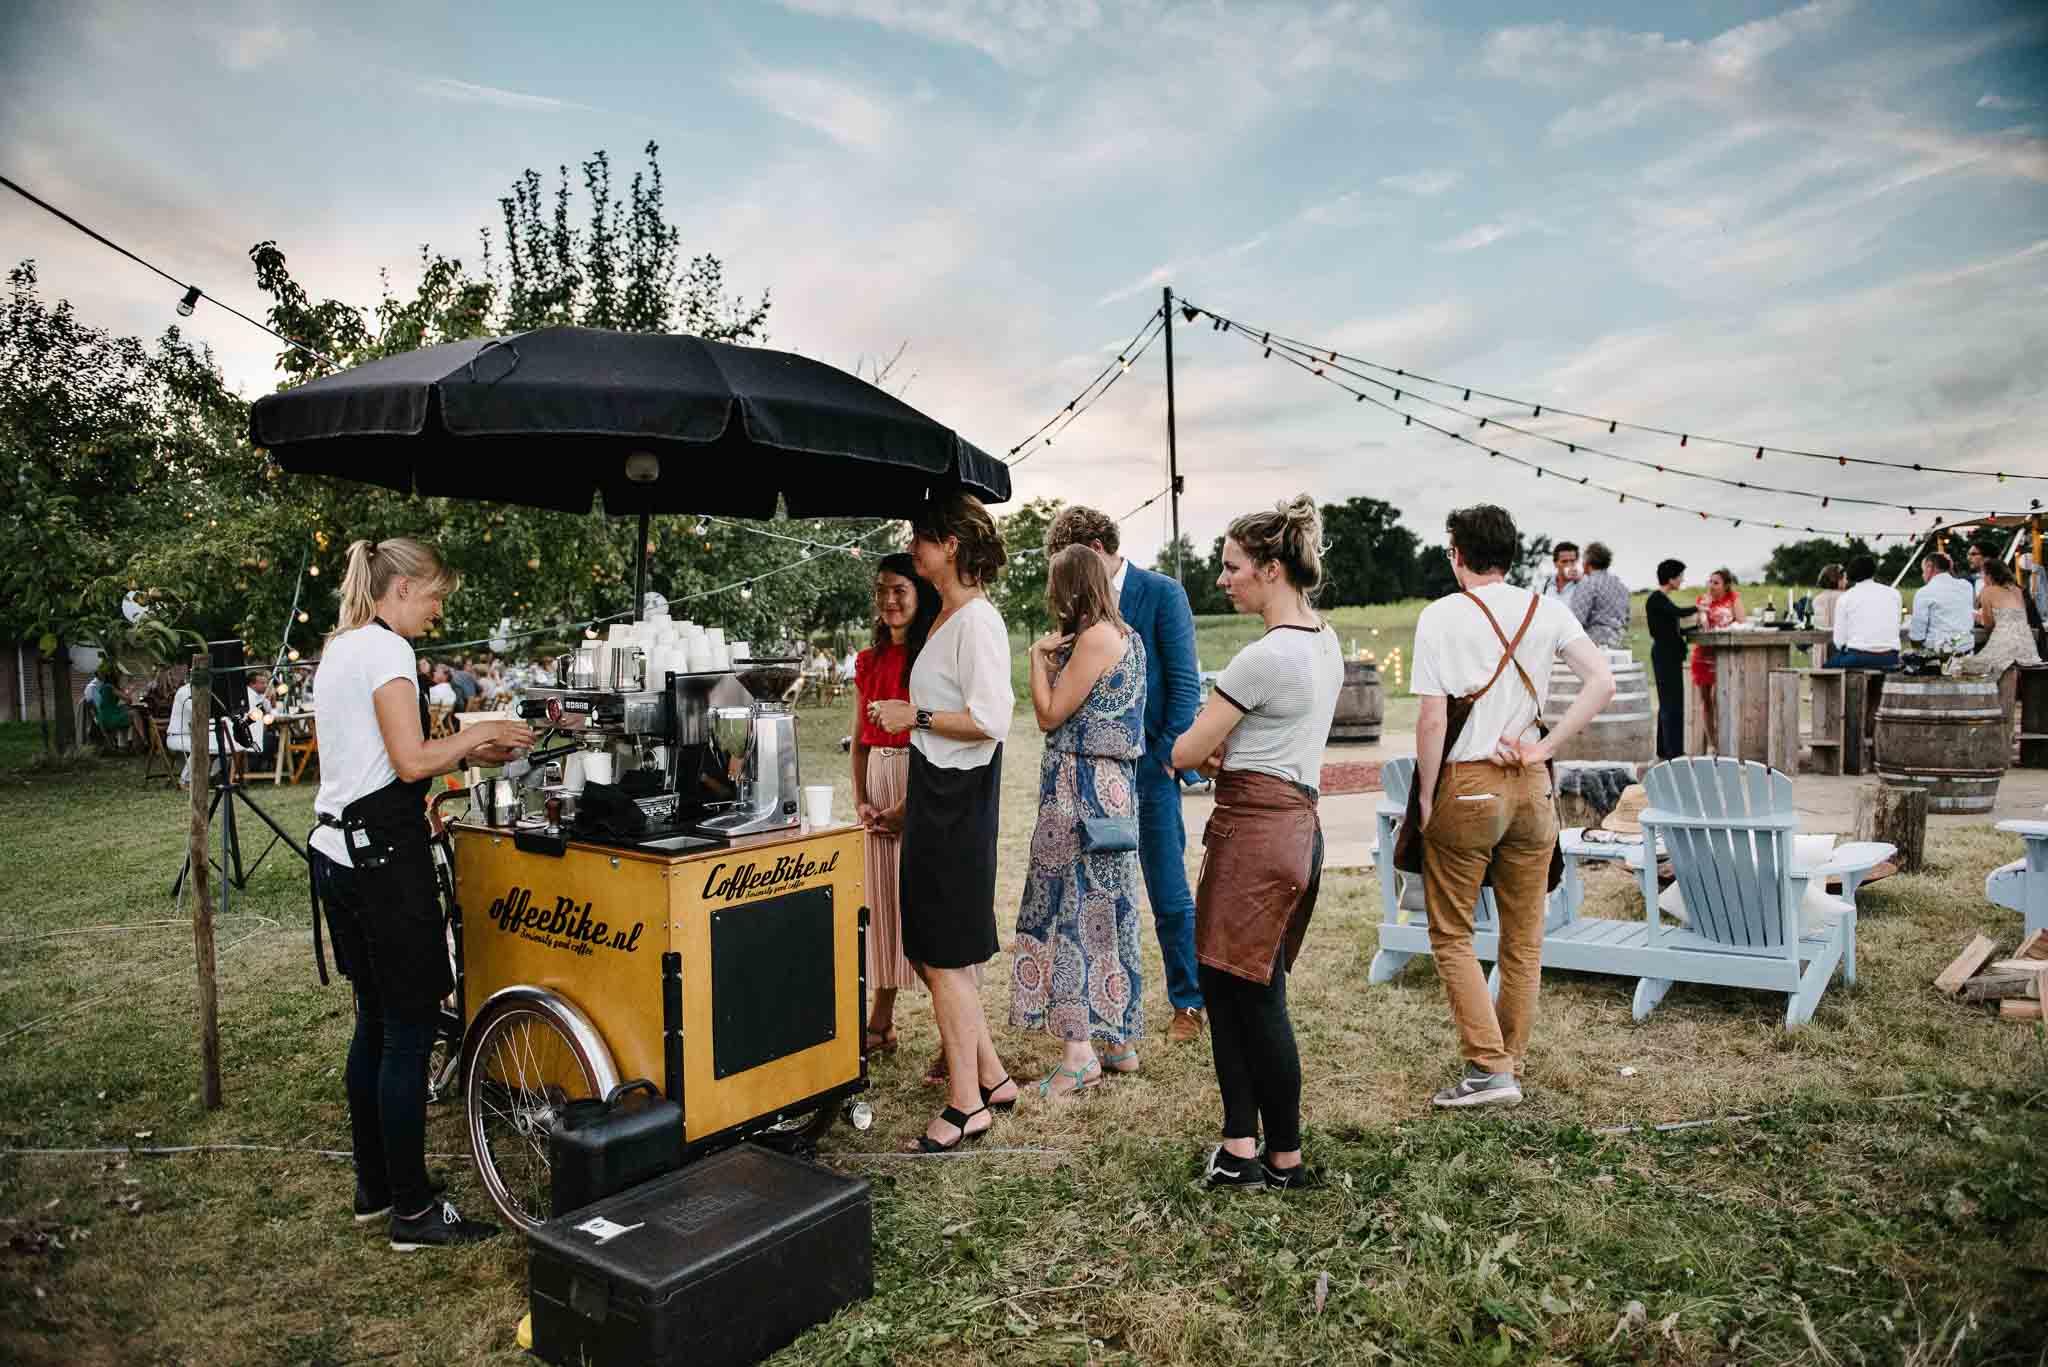 barista fiets op trouwfeest bruiloft festival stijl